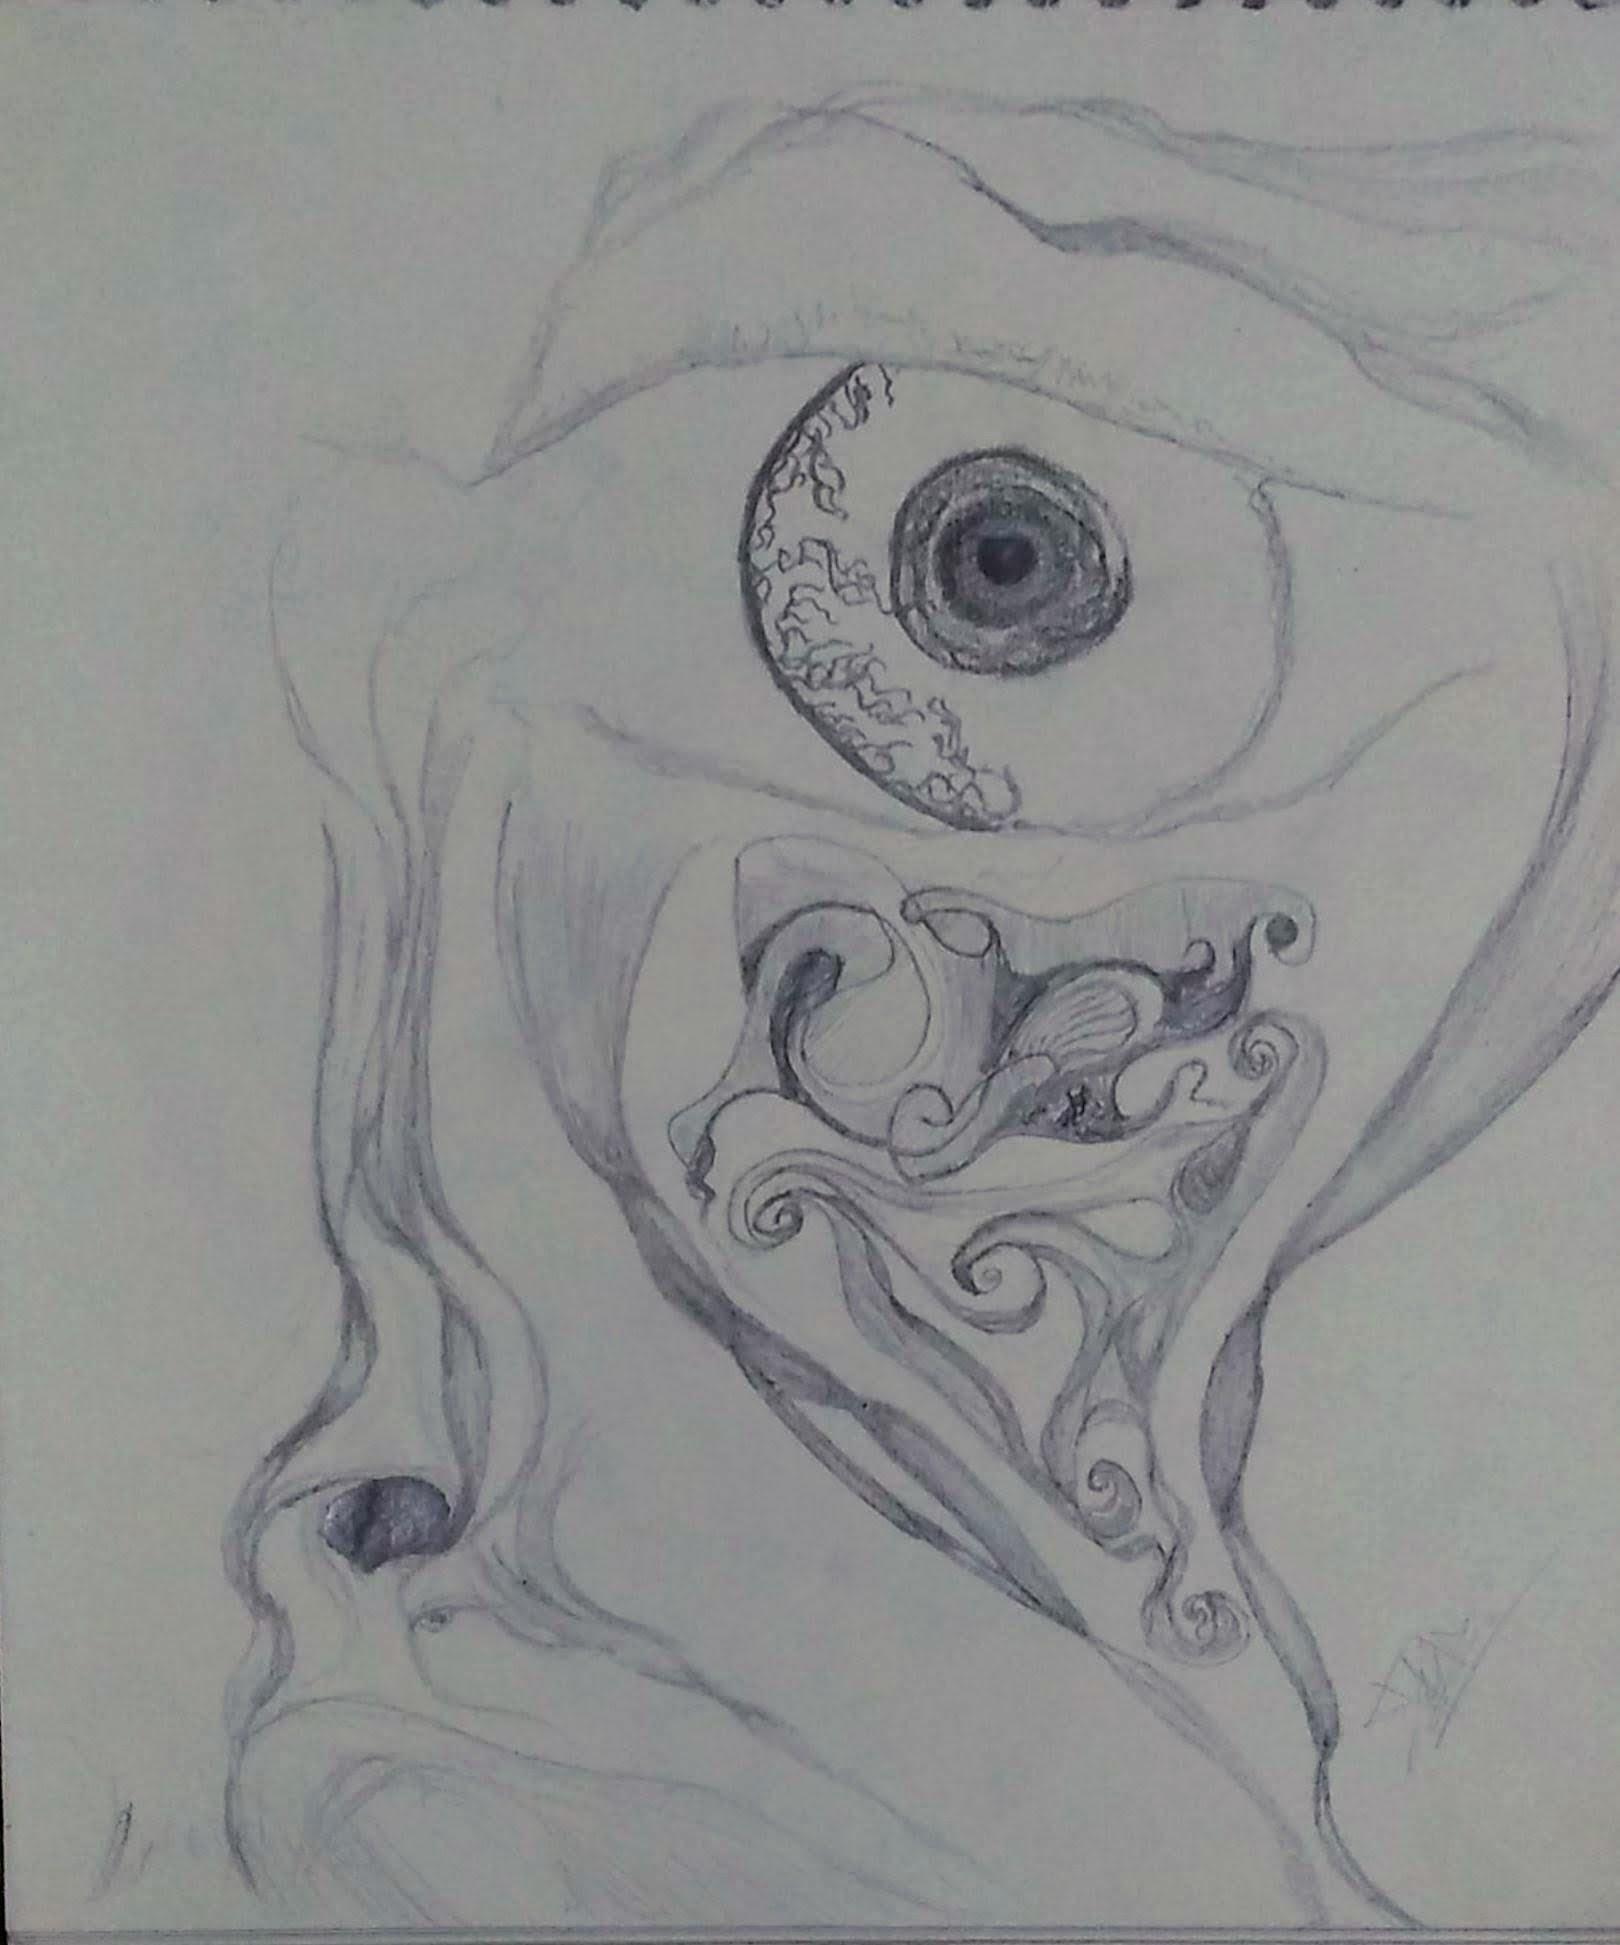 Flare -drawing Showflipper by Deepak Kumar Meena